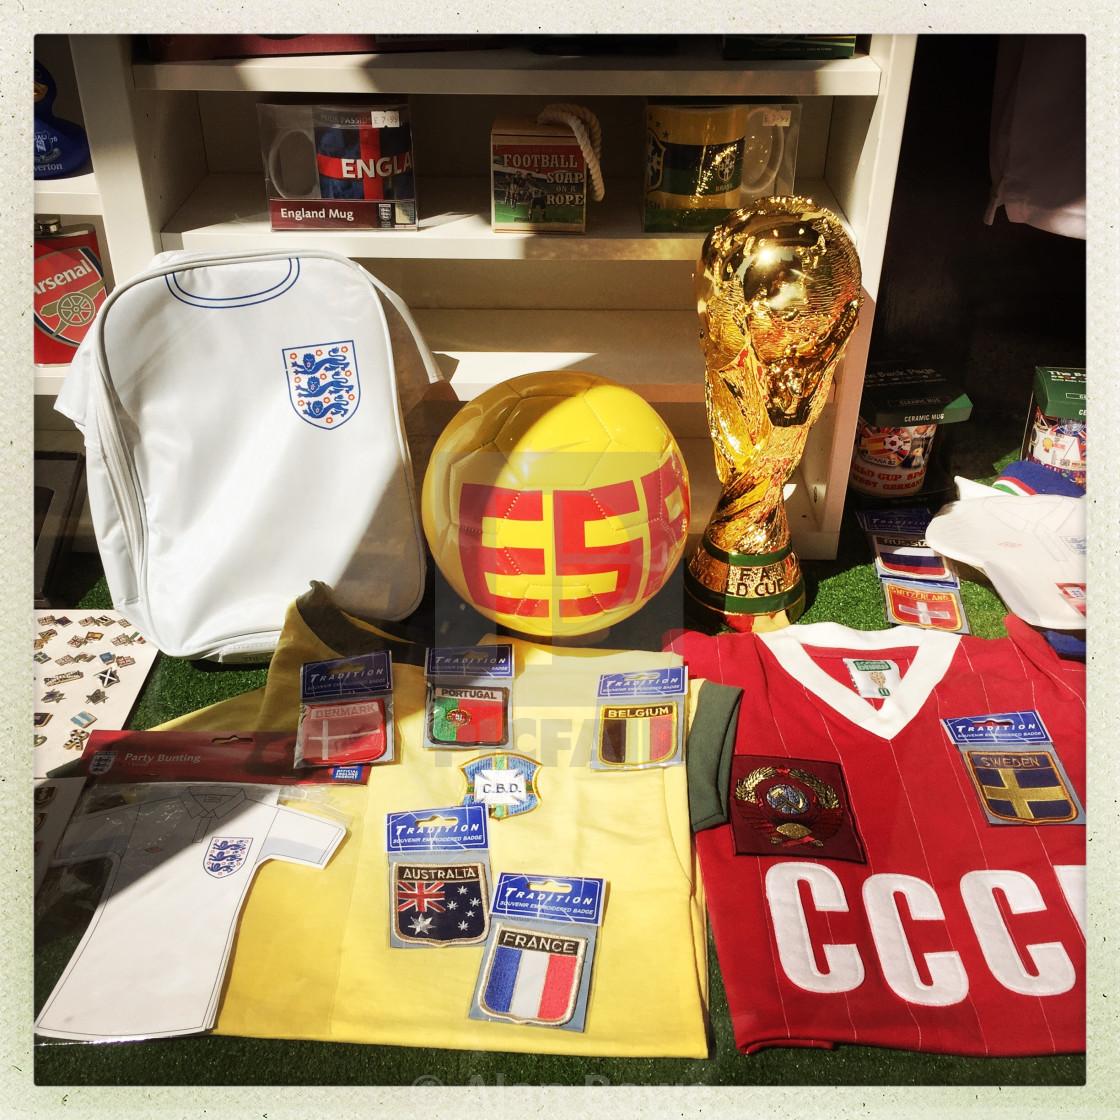 Football memorabilia - License, download or print for £12.40 | Photos |  Picfair